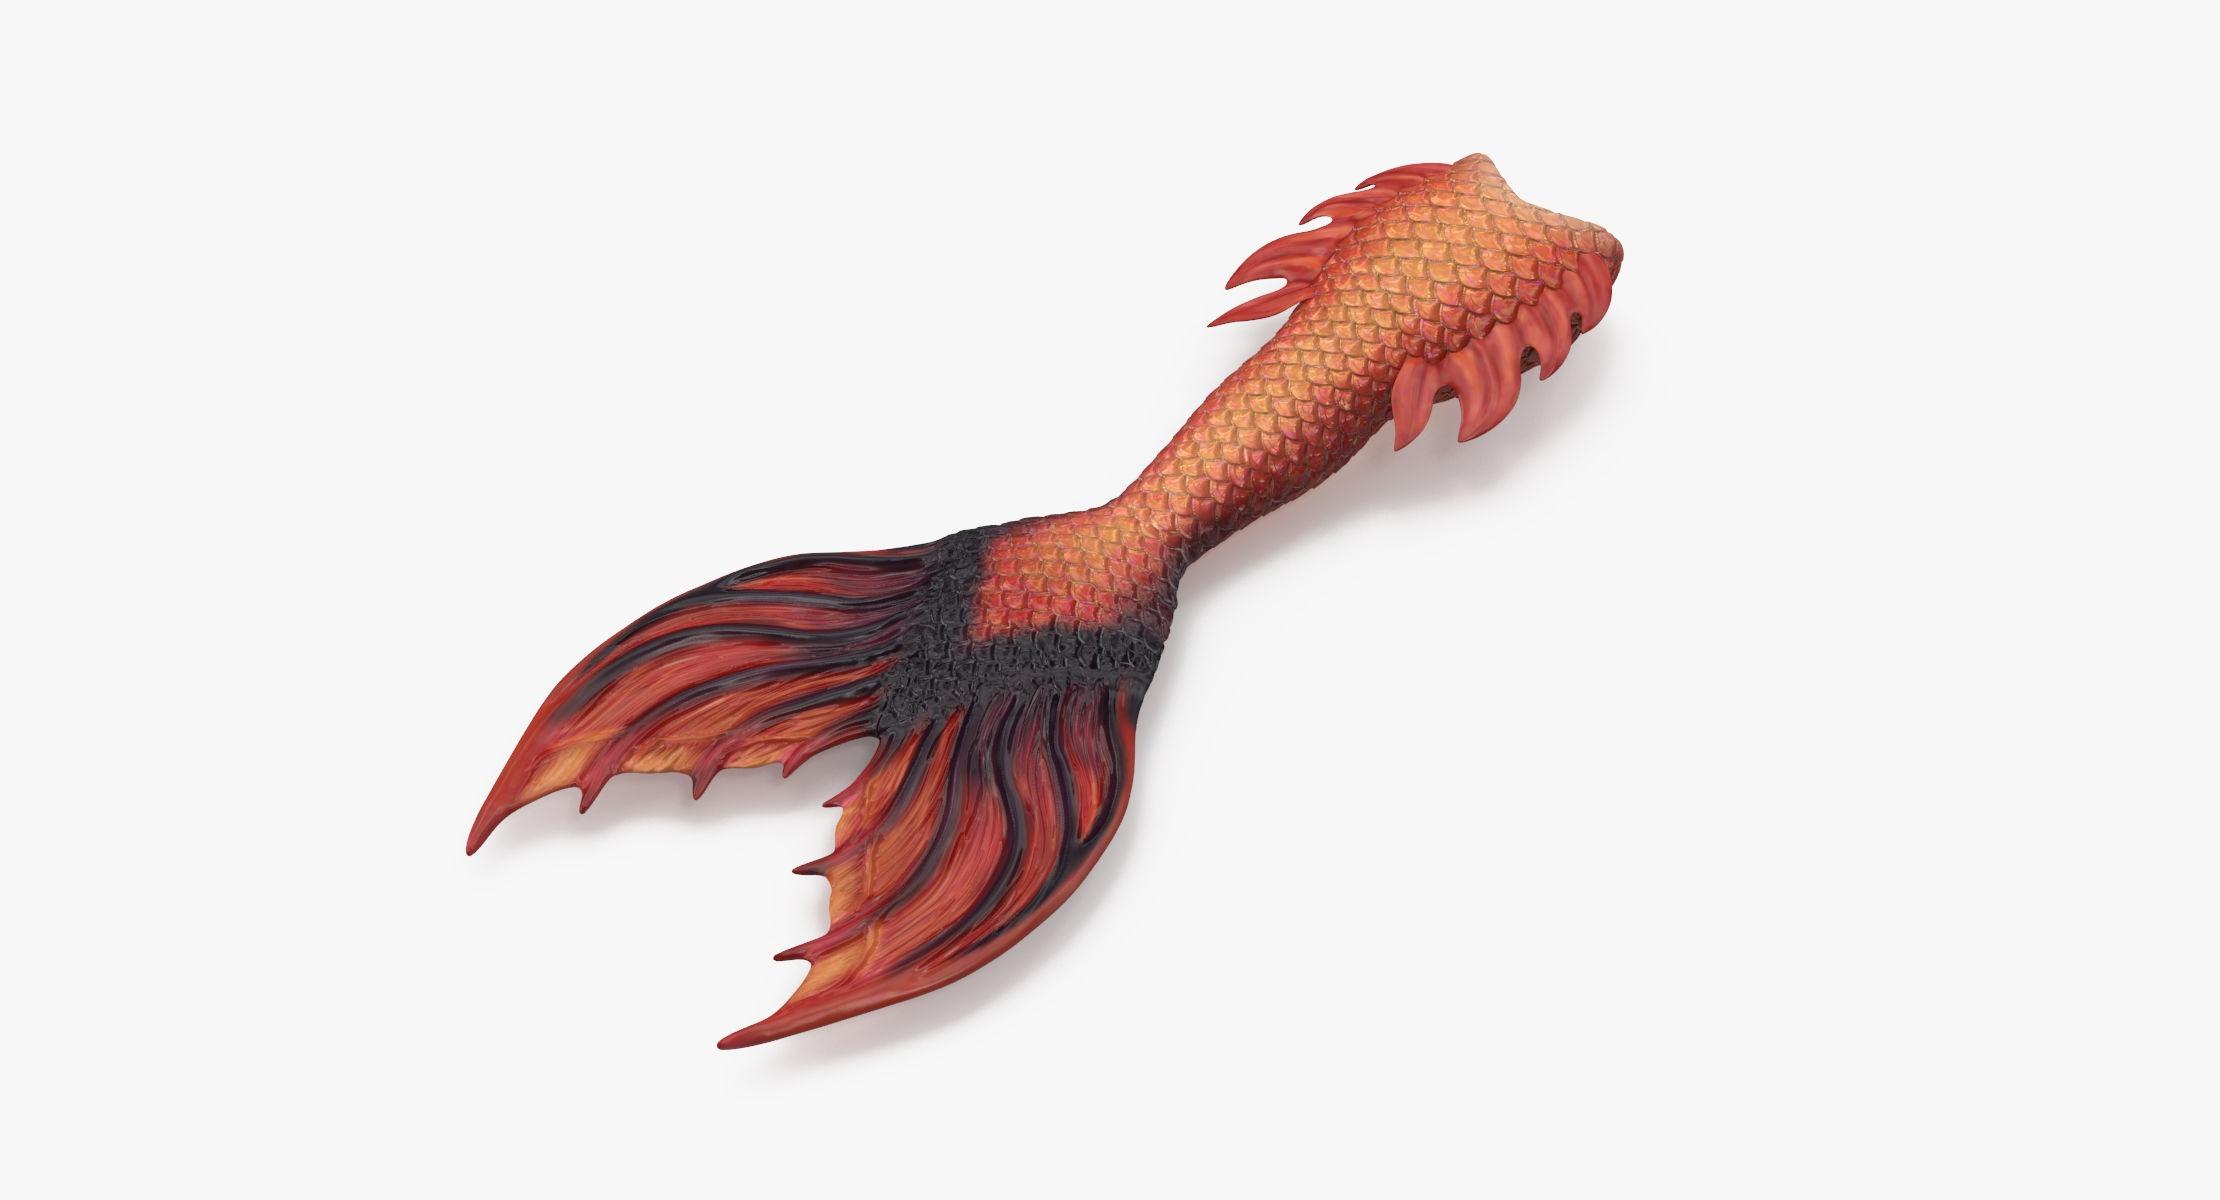 Mermaid Tail 02 Straight - reel 1